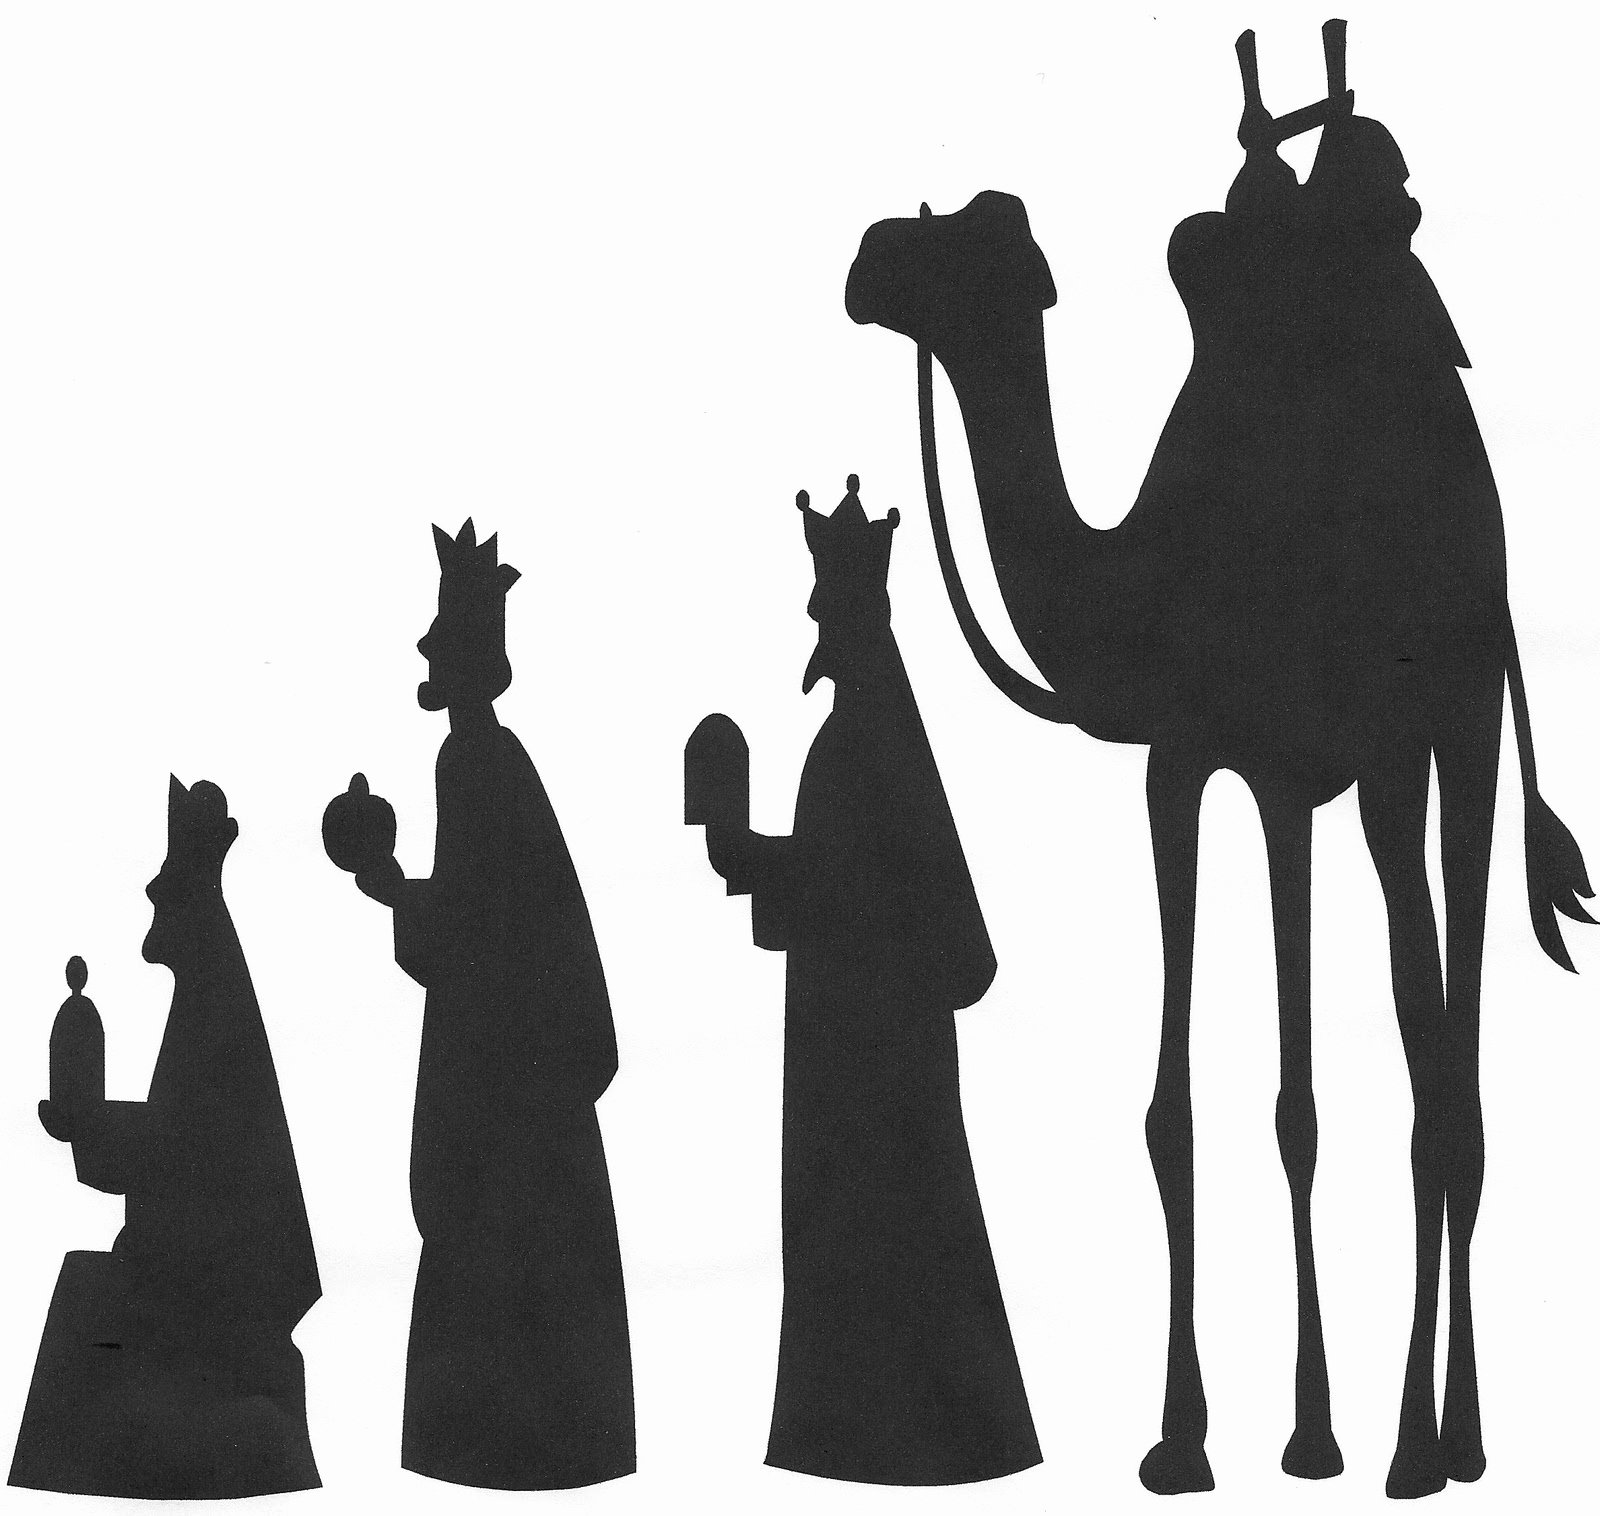 Nativity Scene Silhouette Pattern Inspirational Whitehall Ward R S News November 2010